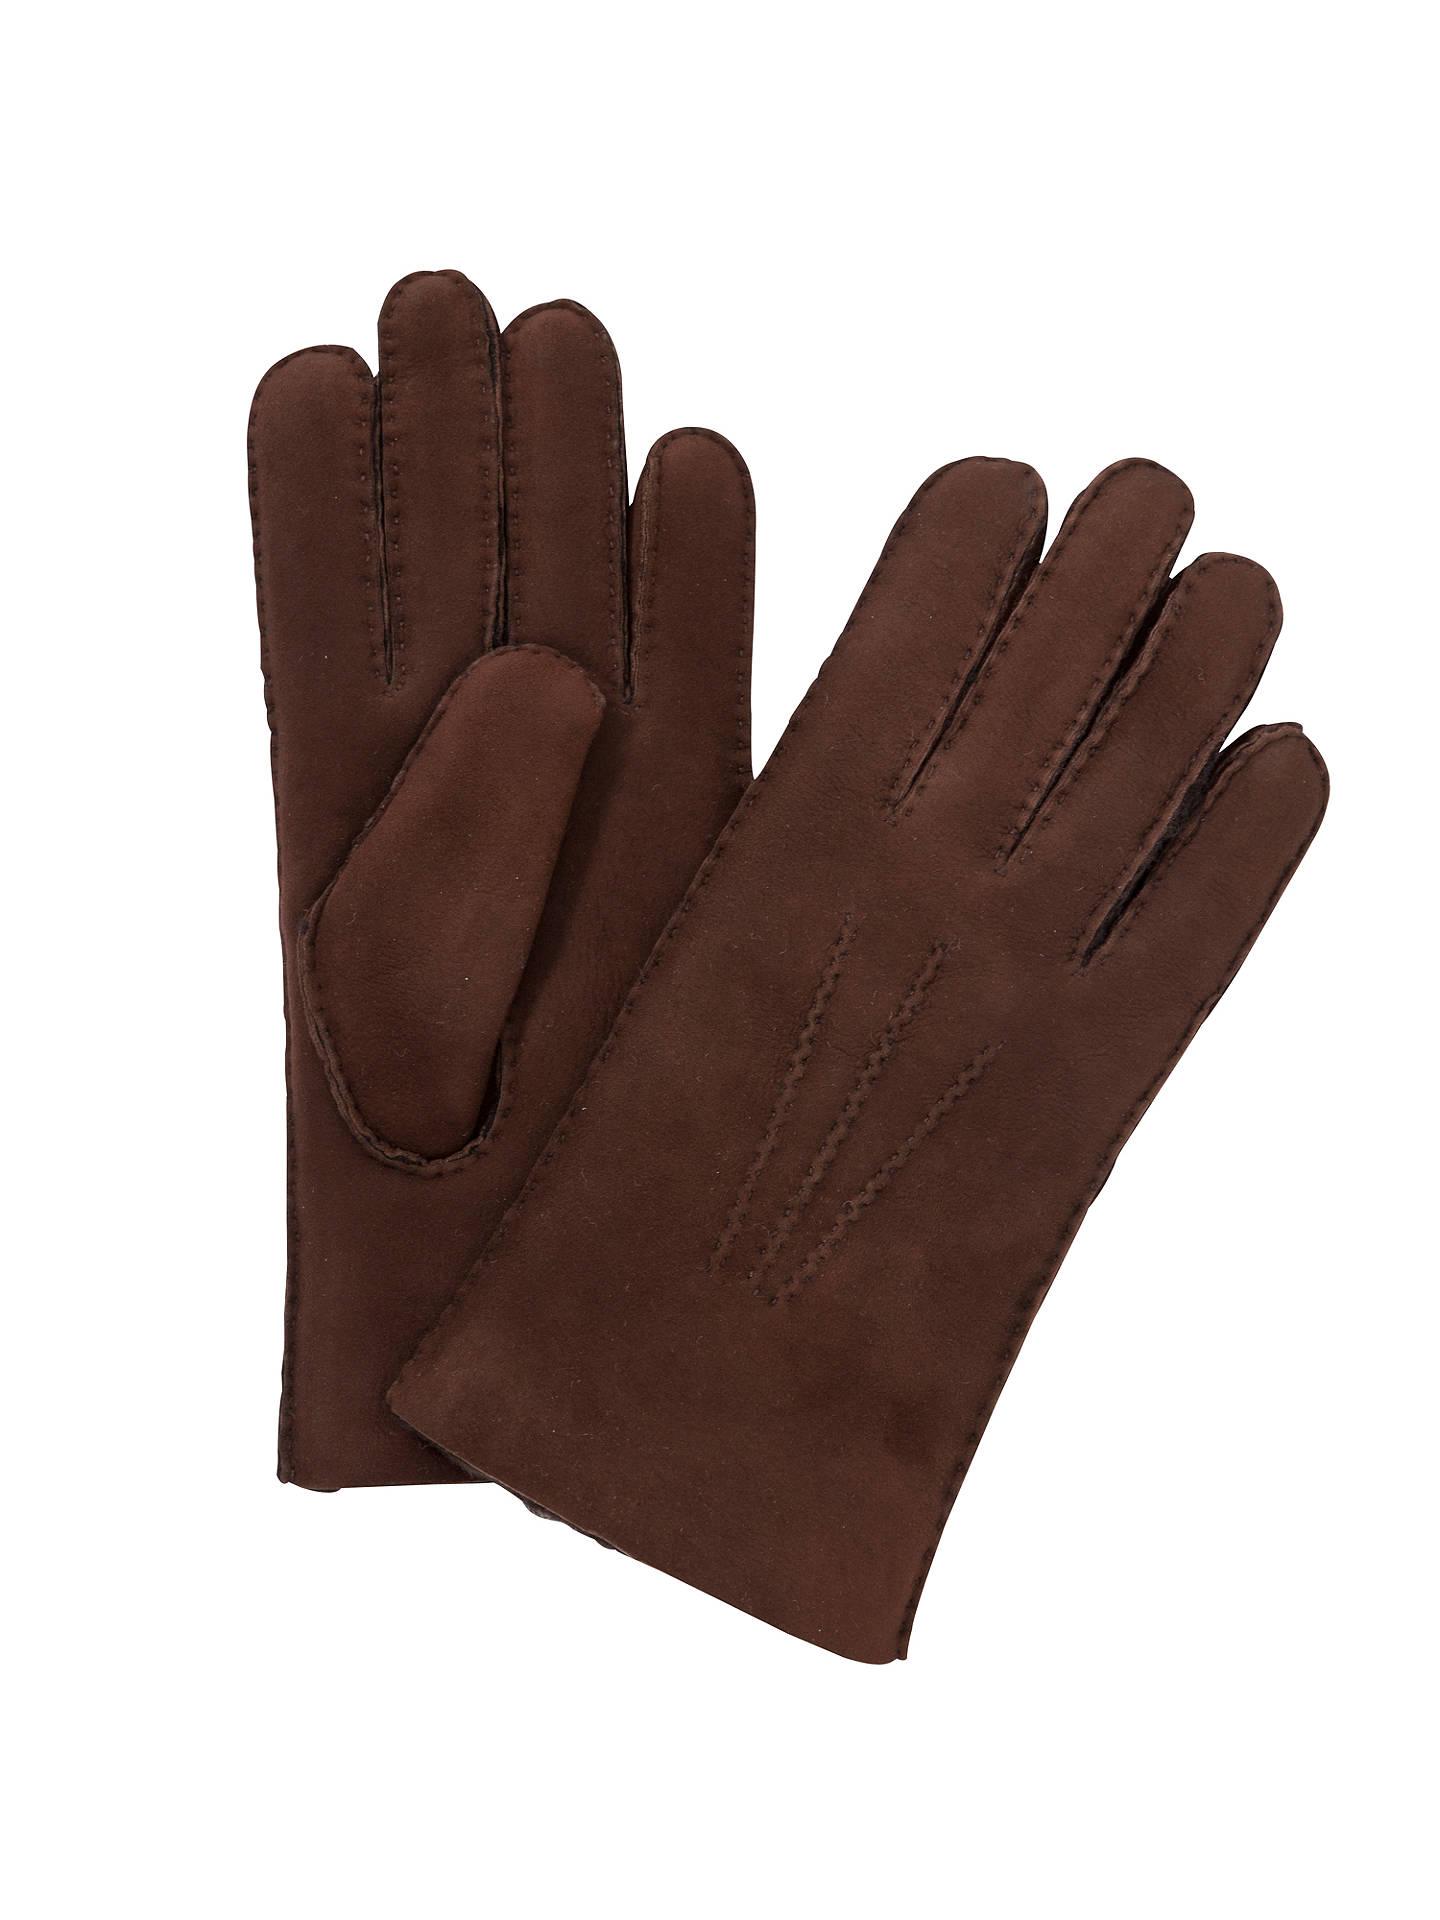 54af950317ff4 Buy John Lewis Lambskin Gloves, Chocolate, M Online at johnlewis.com ...